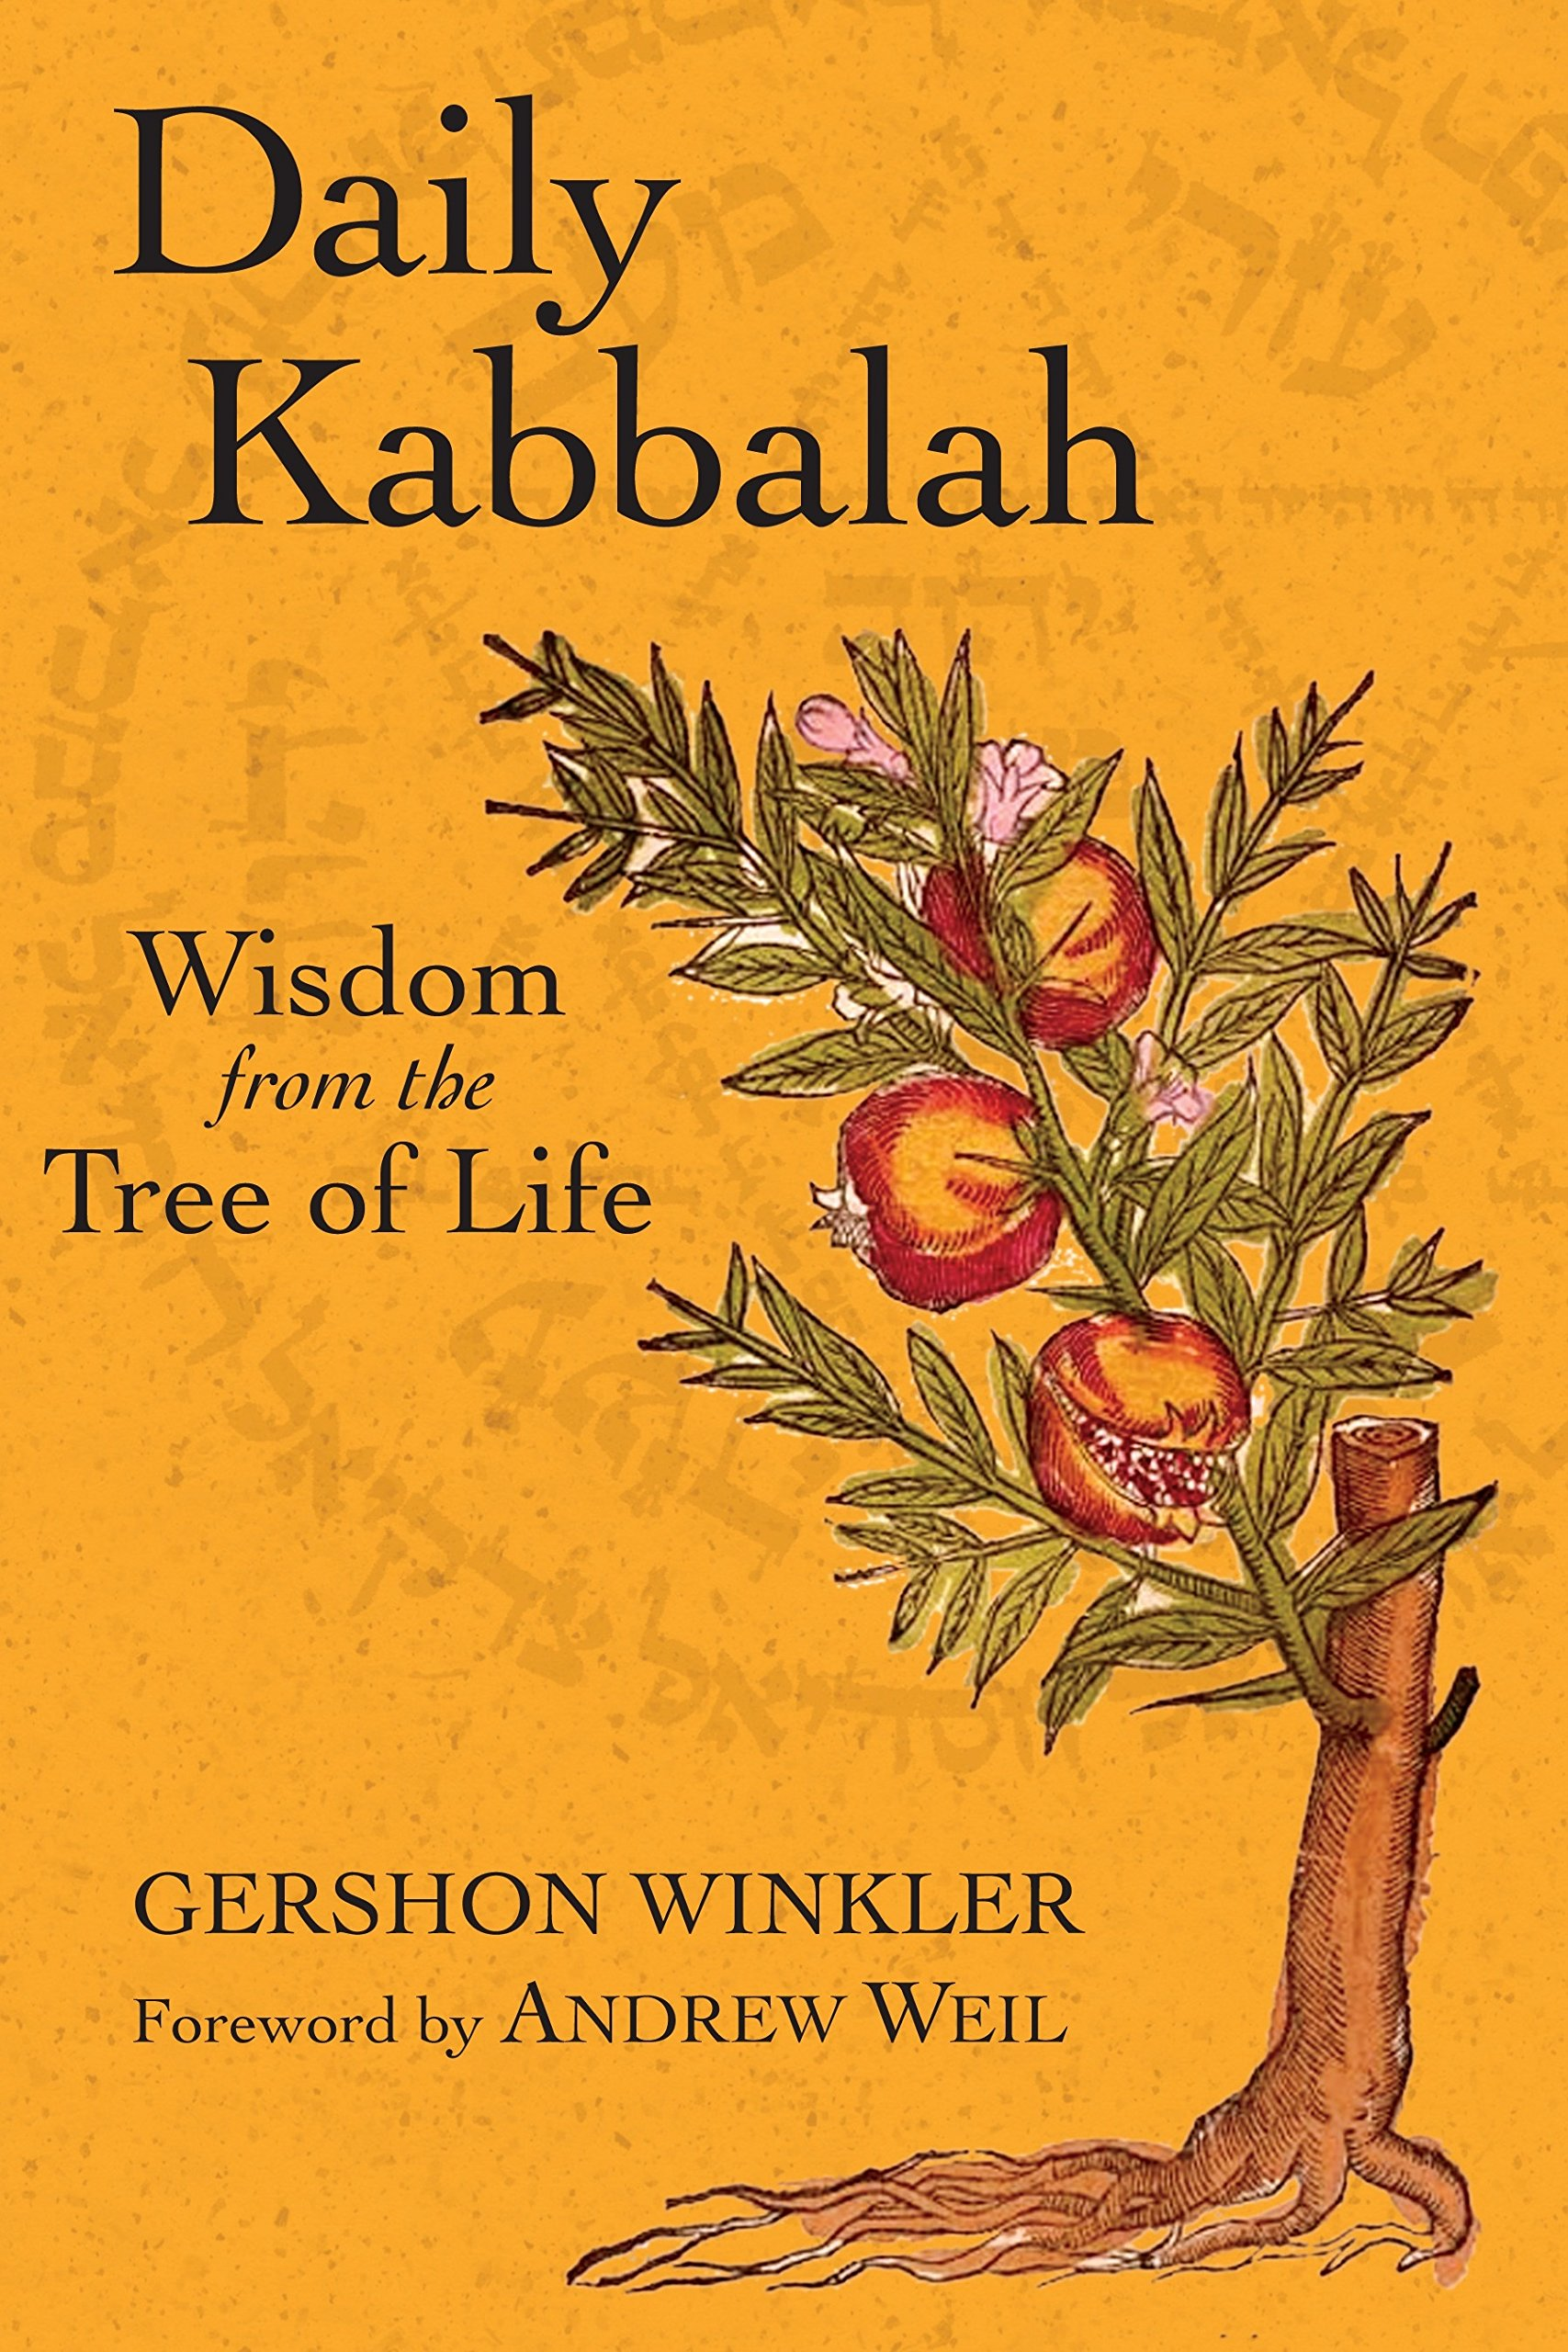 Daily Kabbalah: Wisdom from the Tree of Life